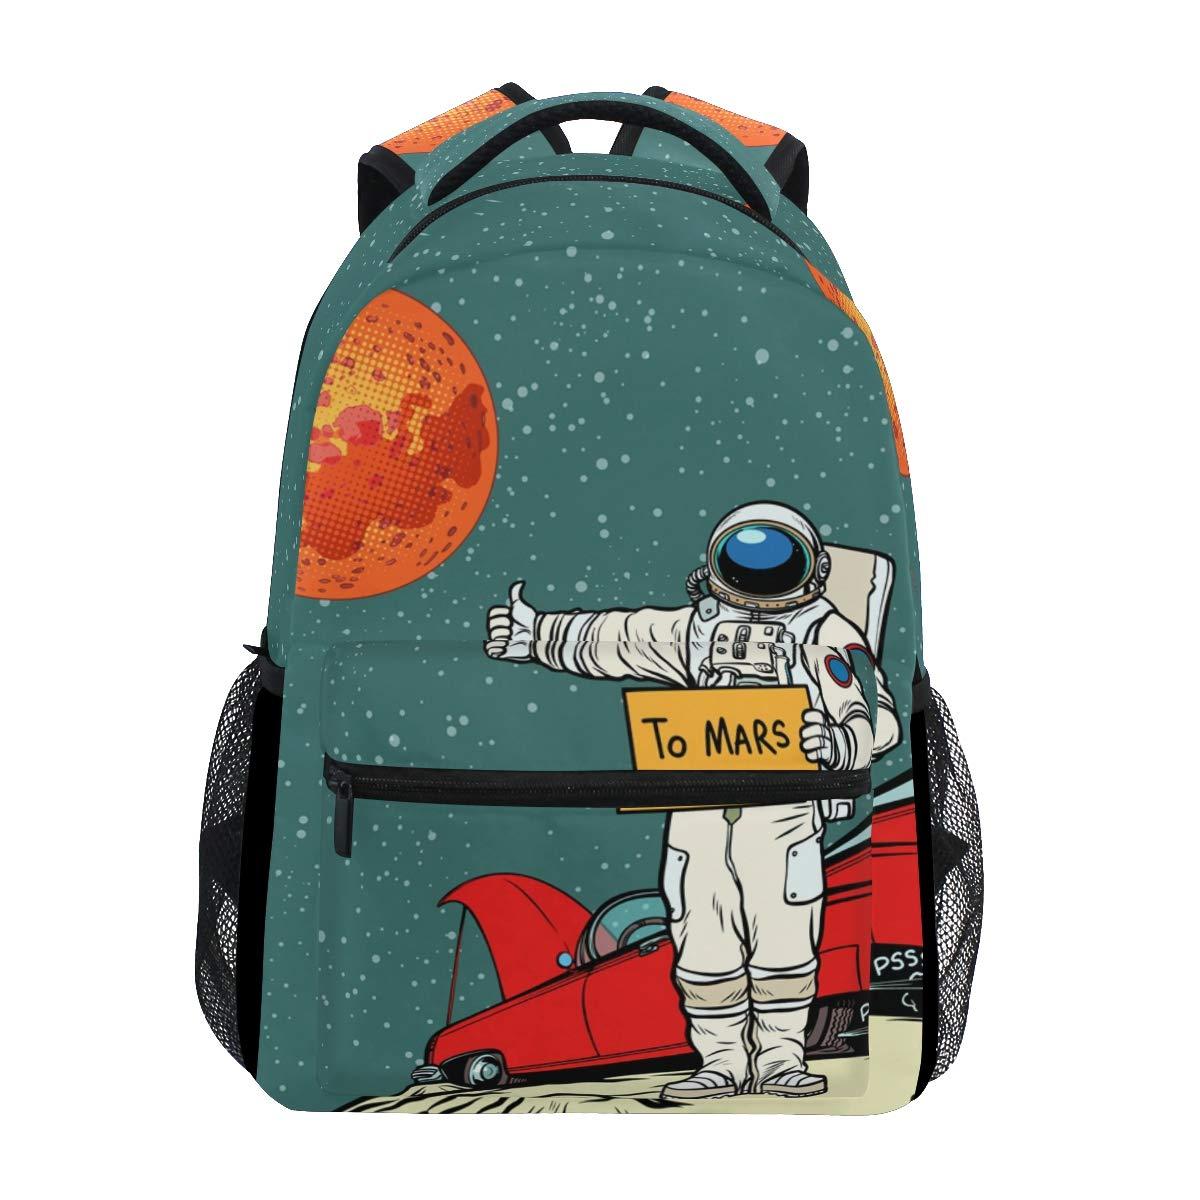 ALAZA Tropical Lemon Citrus Fruit Large Backpack Personalized Laptop iPad Tablet Travel School Bag with Multiple Pockets